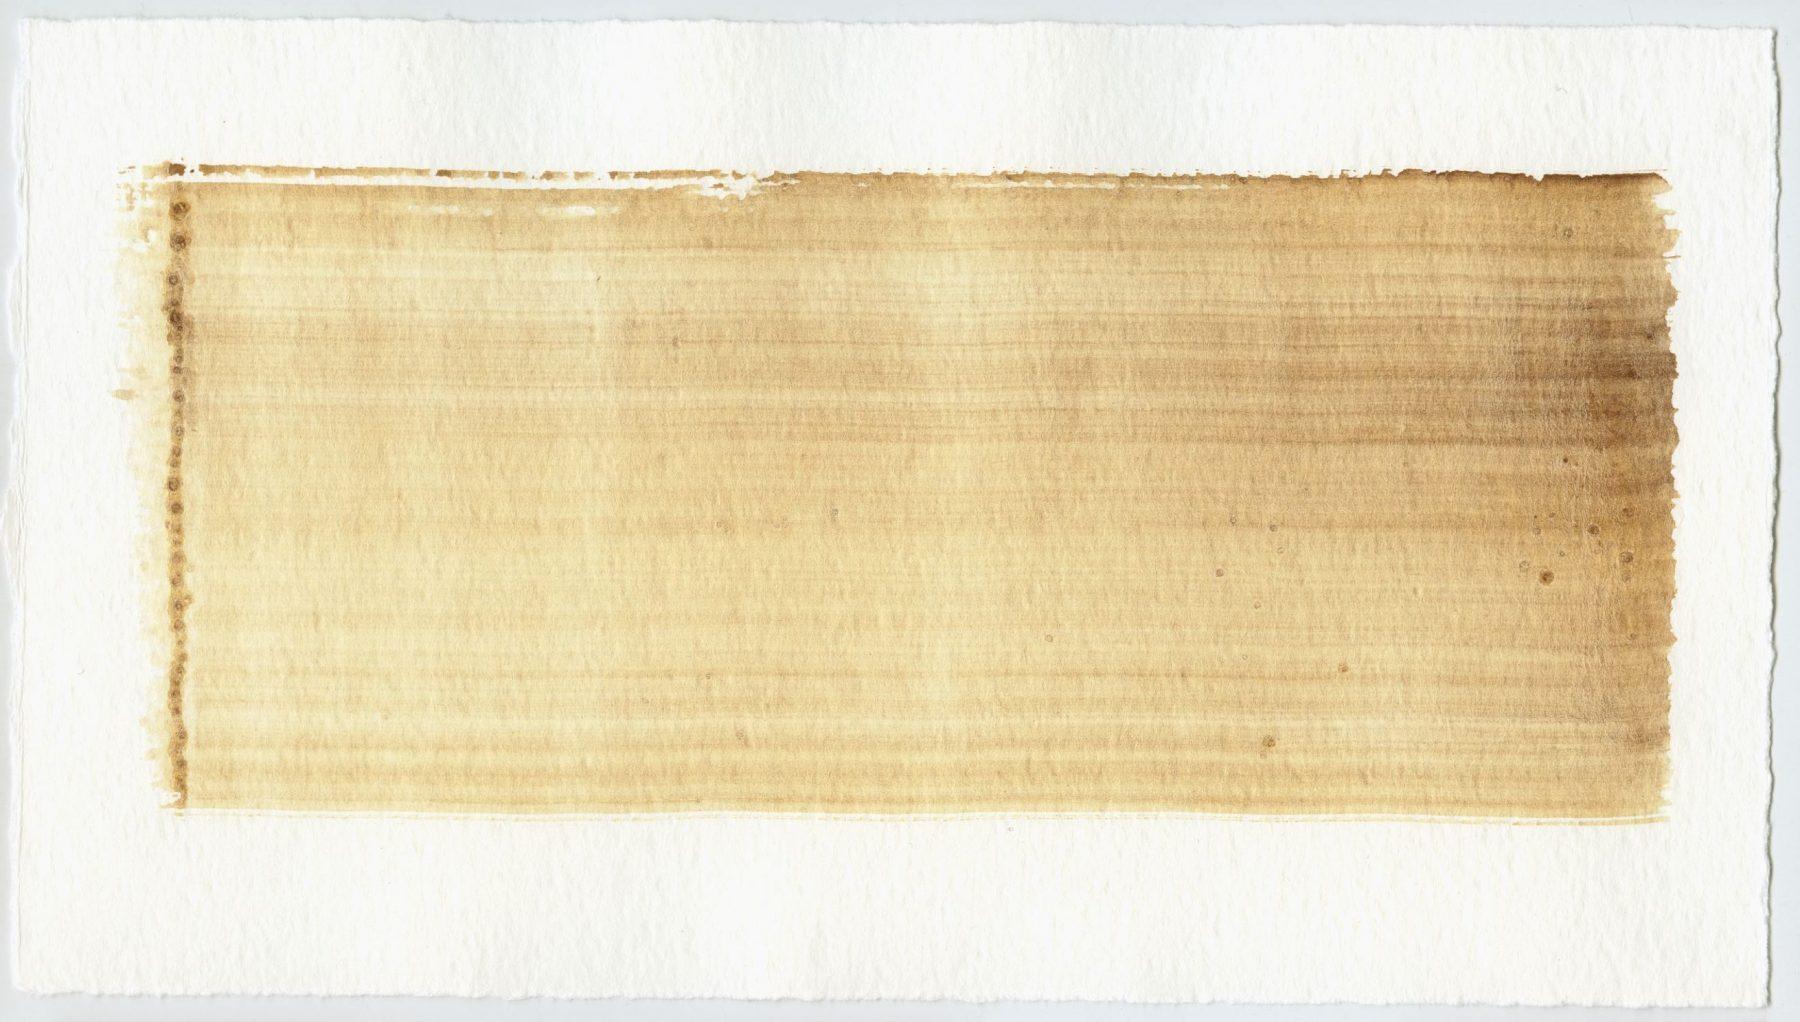 Brush stroke no. 125 - Selfmade pigment: IJzeroer